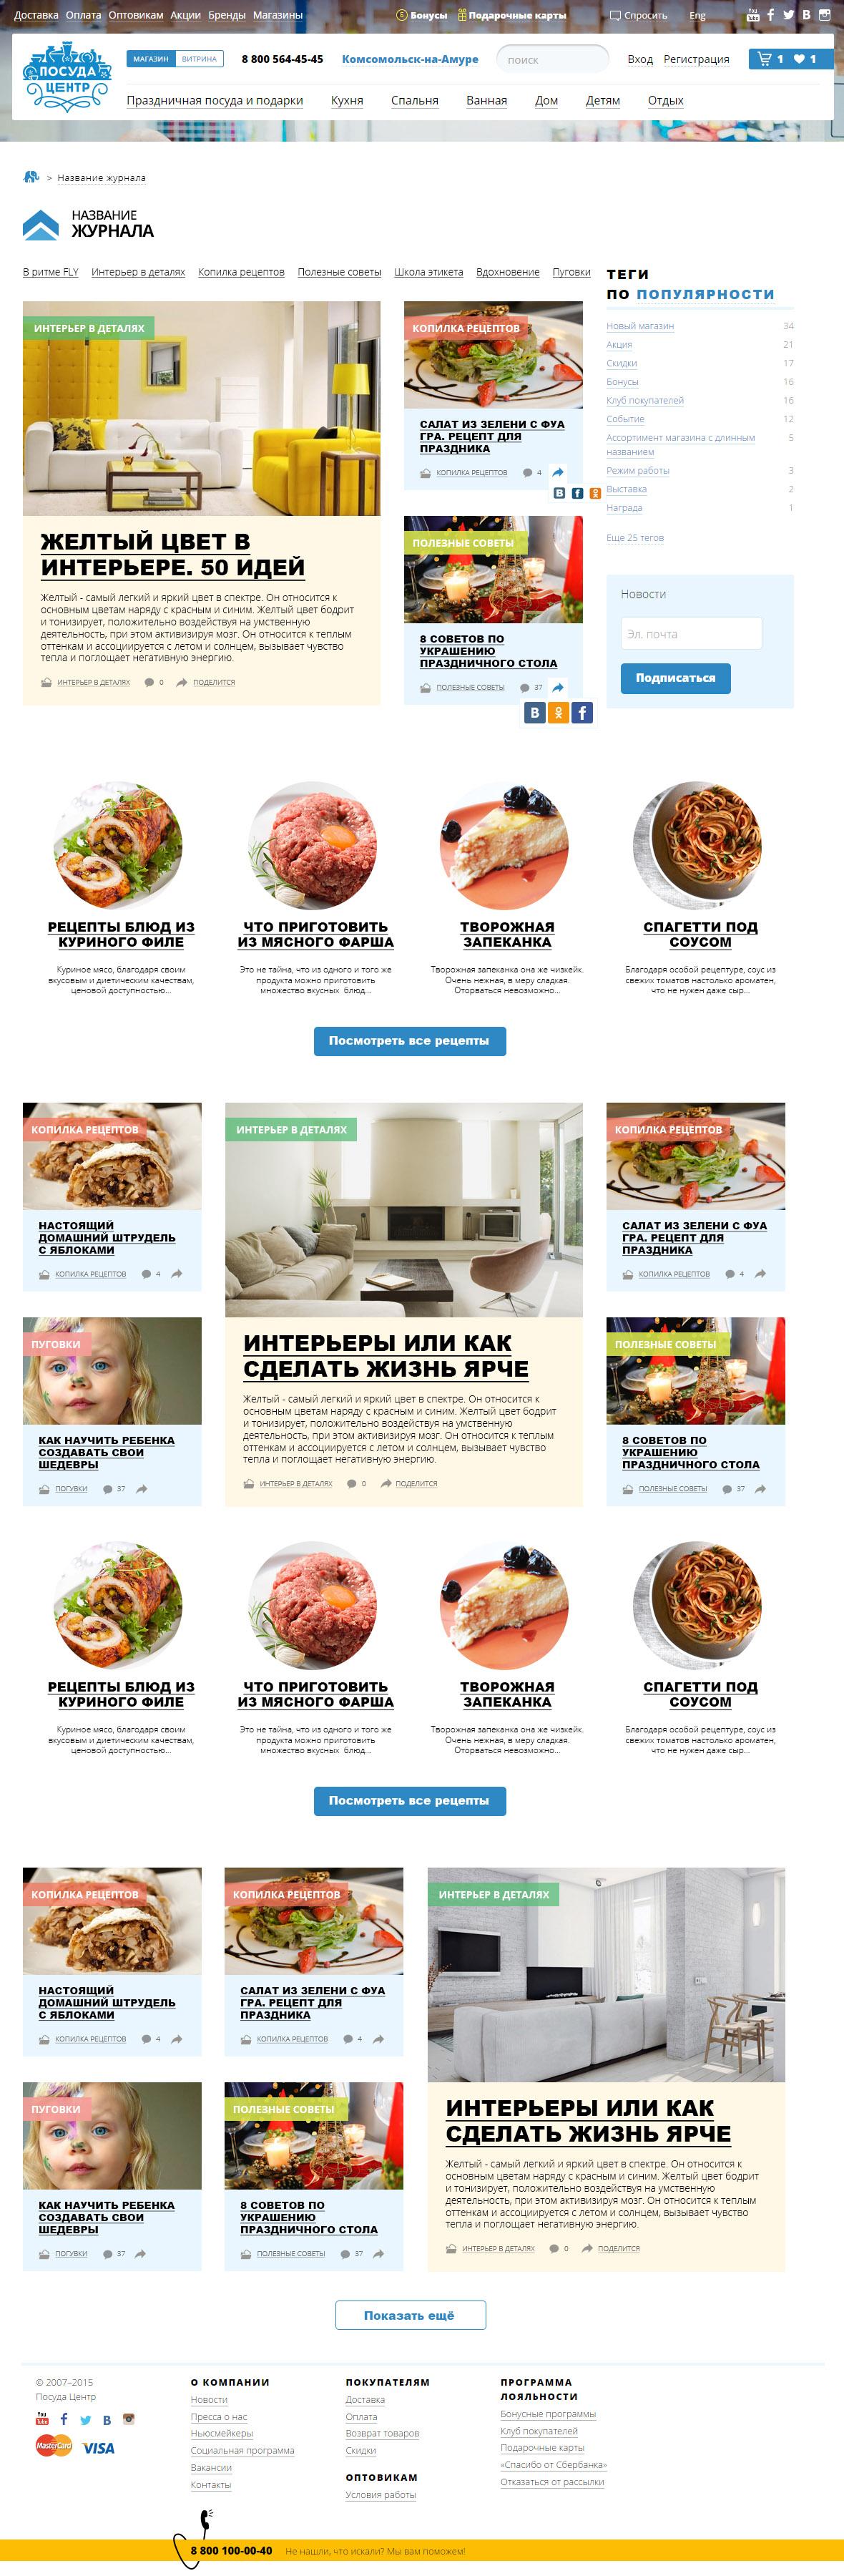 Посуда Центр, журнал раздел, совместно c artlebedev